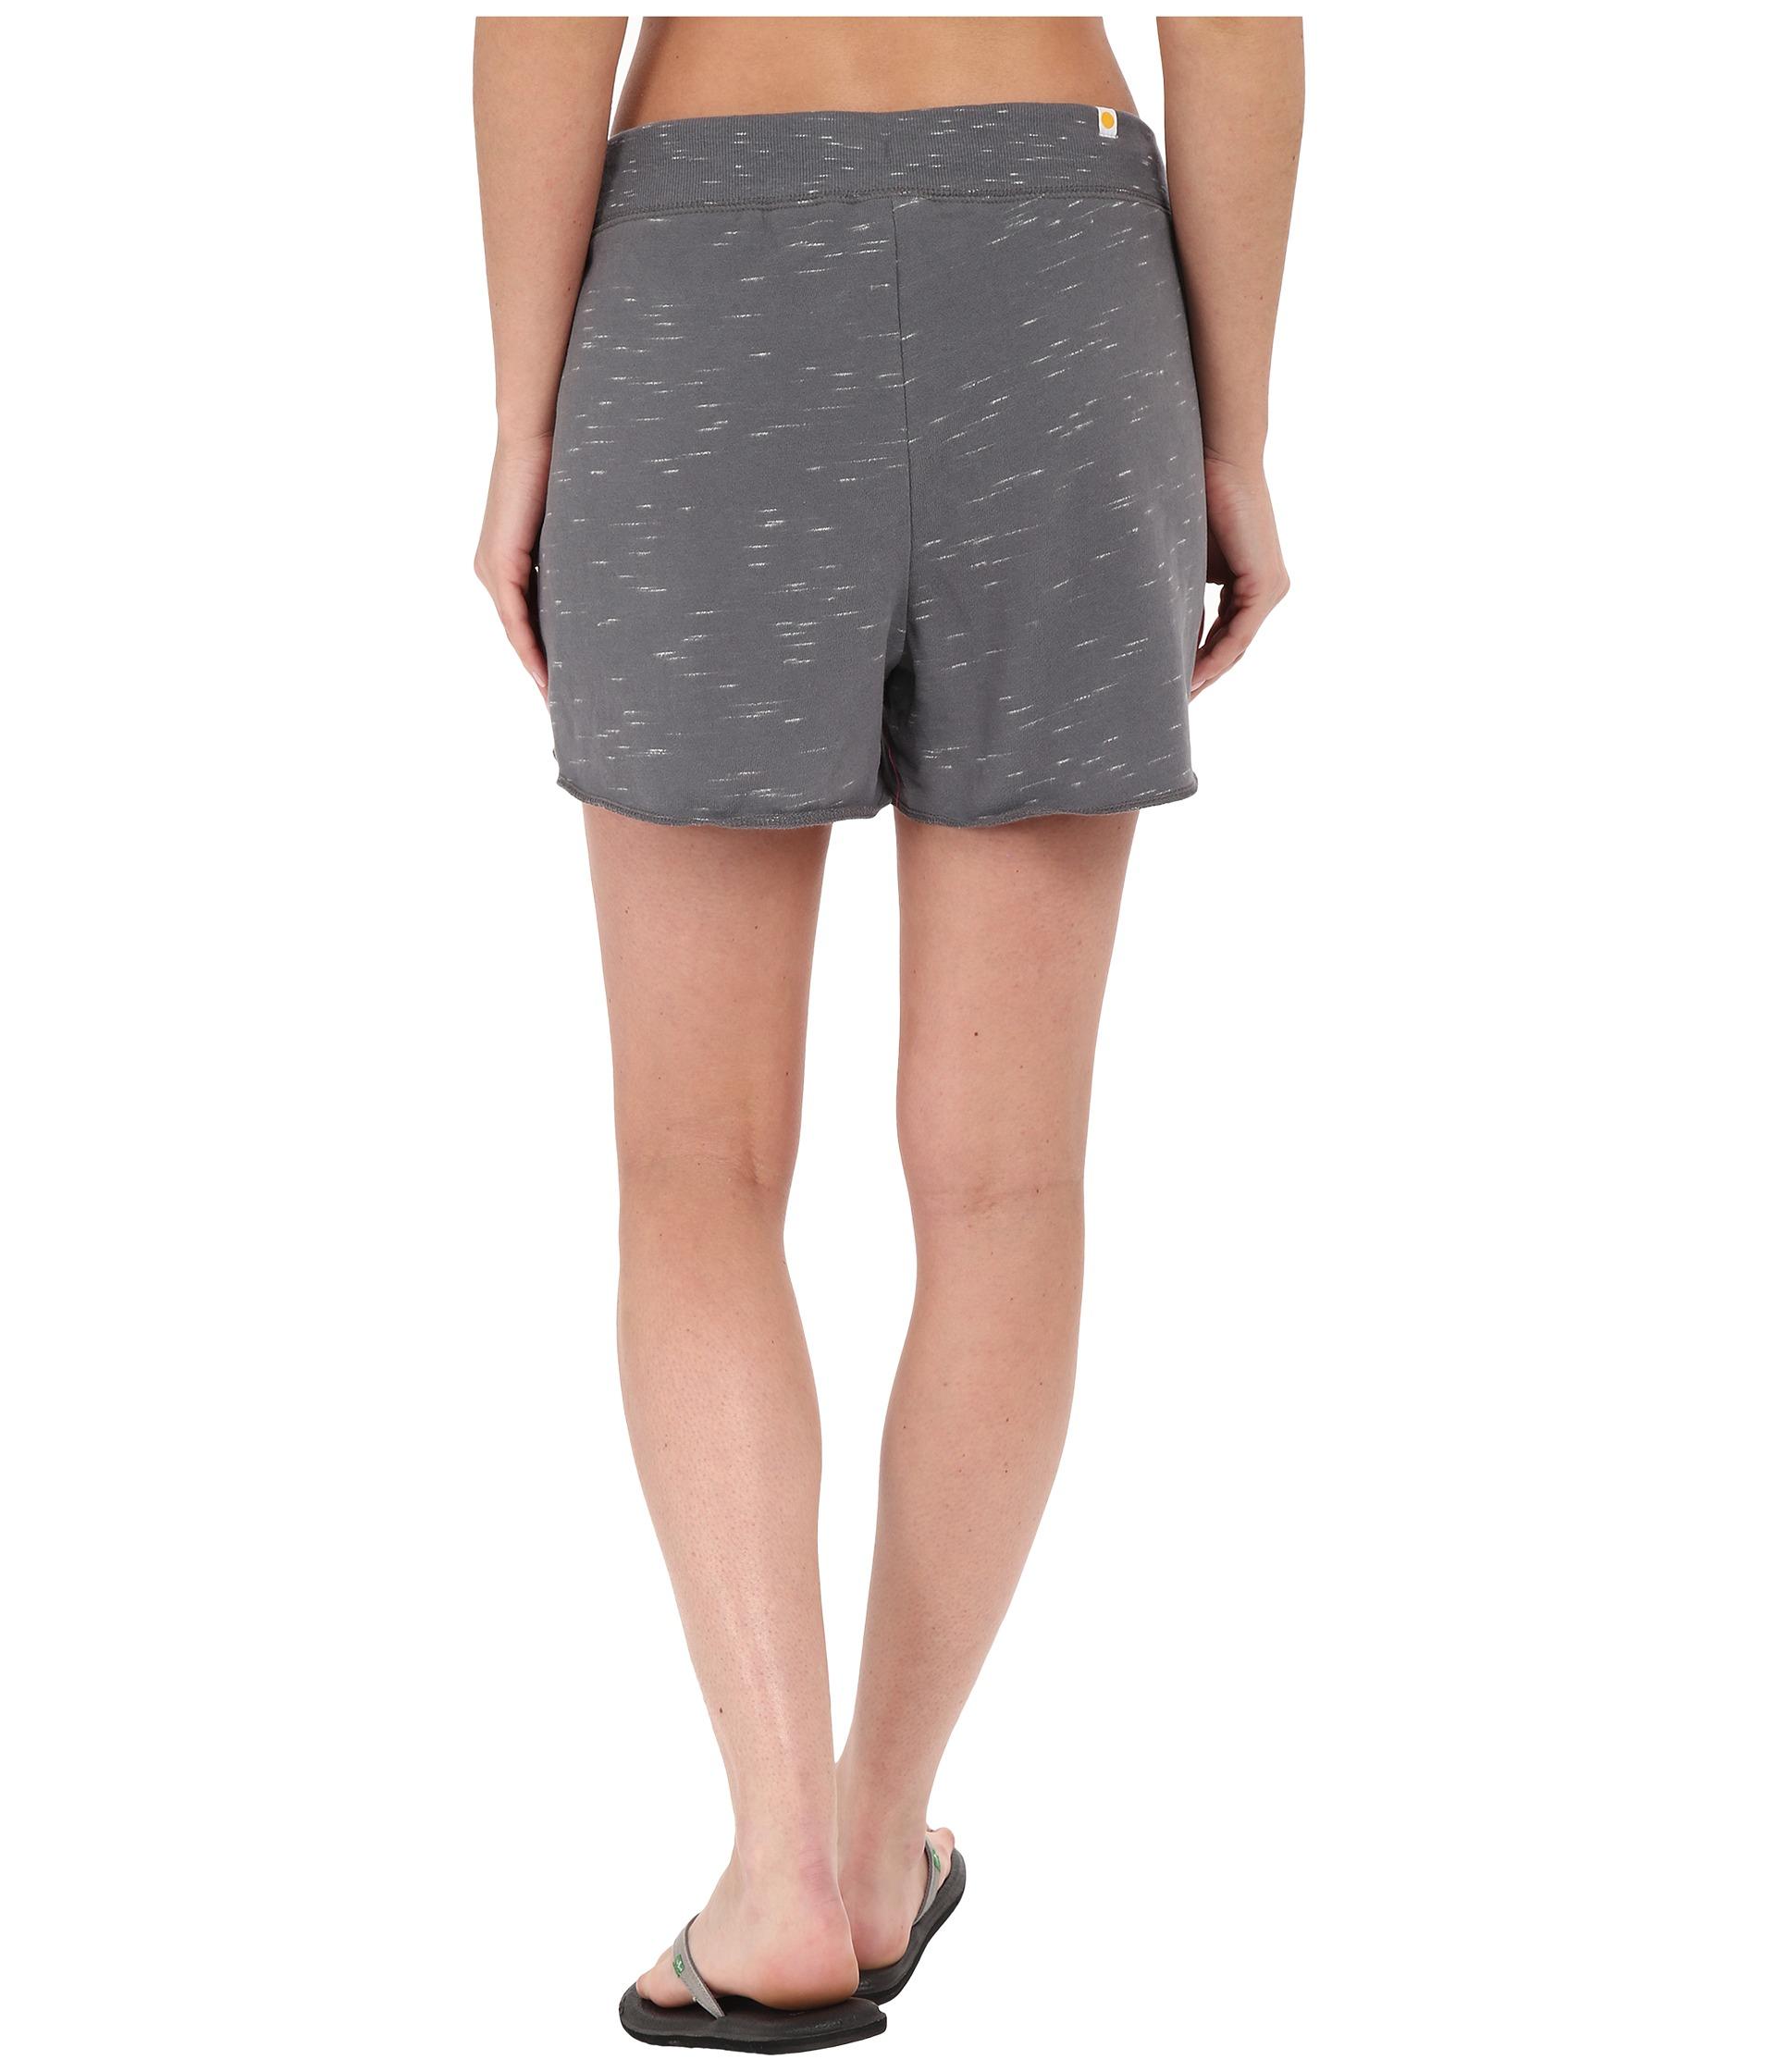 space shuttle women shorts - photo #2